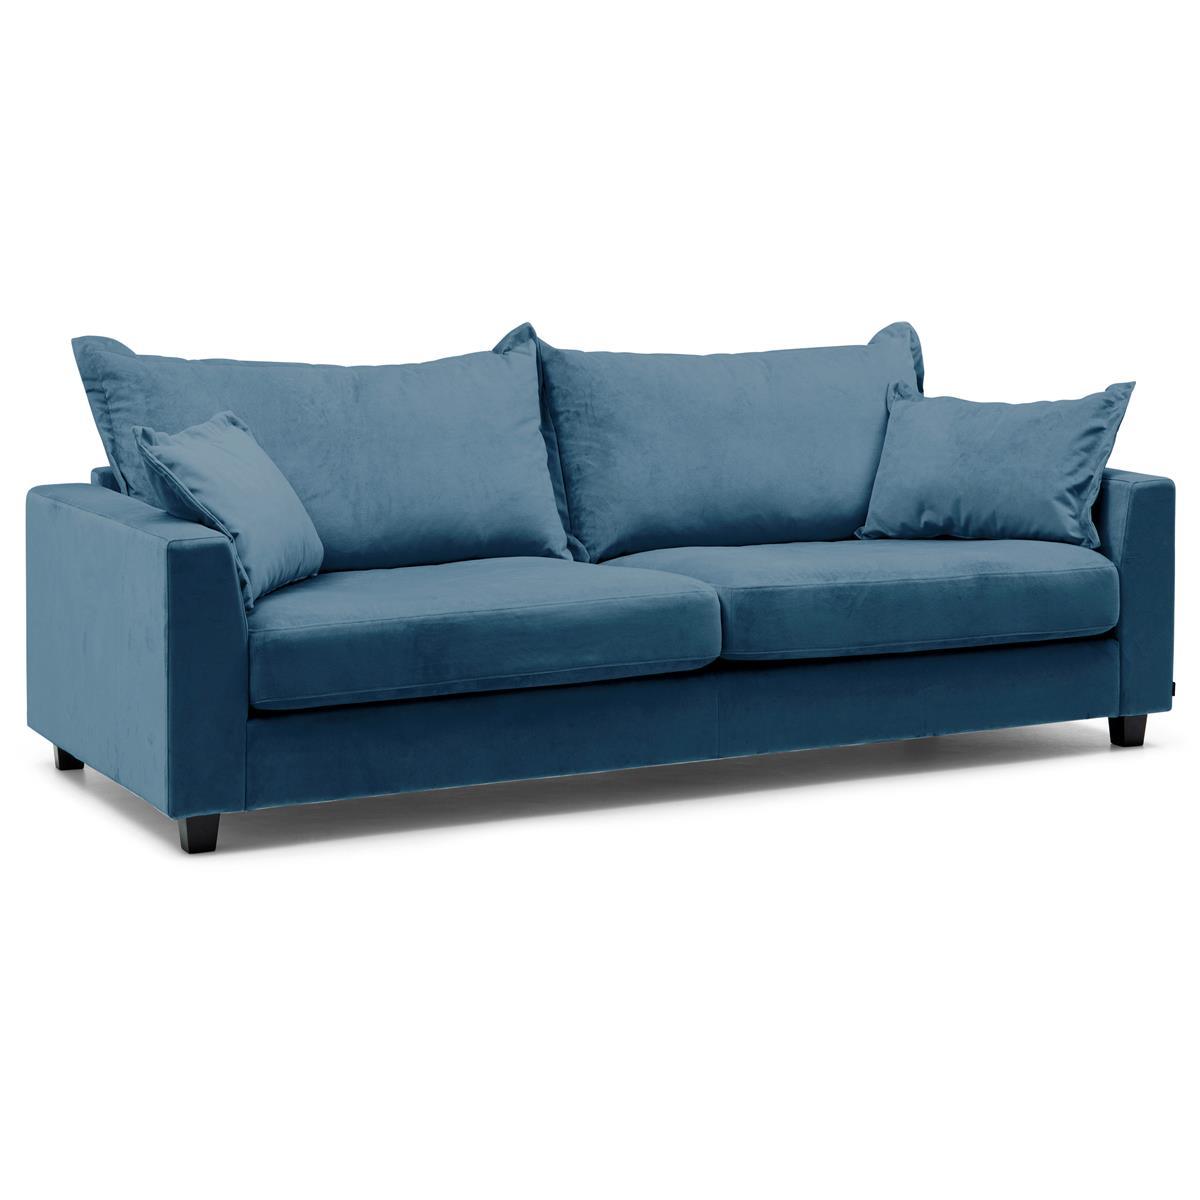 Louise-soffa-3-sits-meda-bluesteel